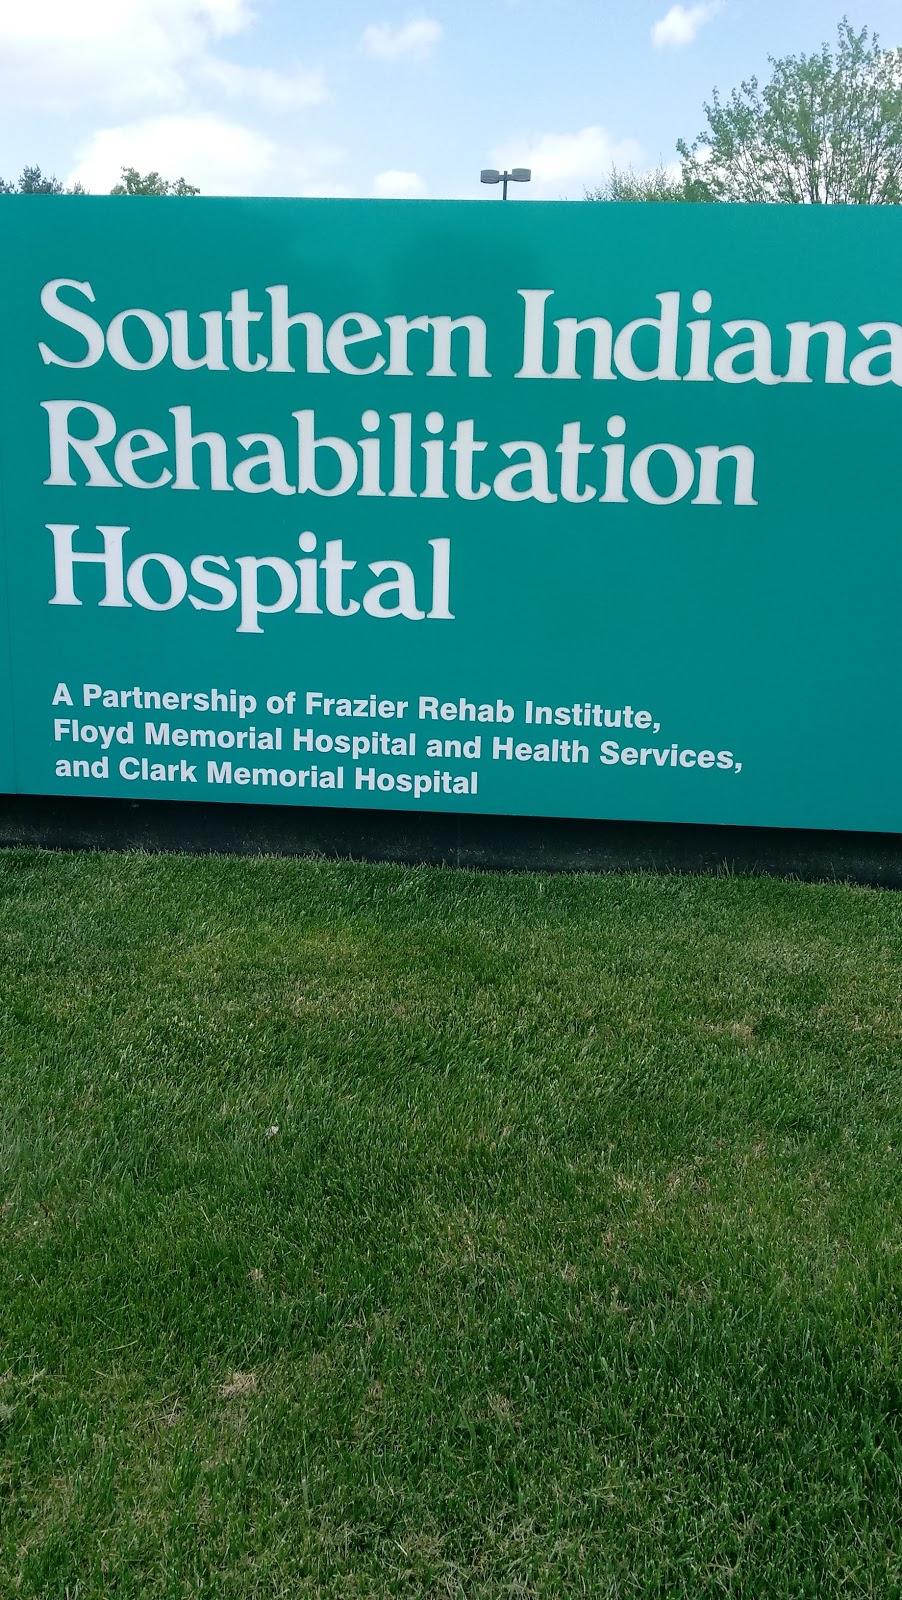 Southern Indiana Rehabilitation Hospital - hospital  | Photo 6 of 7 | Address: 3104 Blackiston Blvd, New Albany, IN 47150, USA | Phone: (812) 941-8300